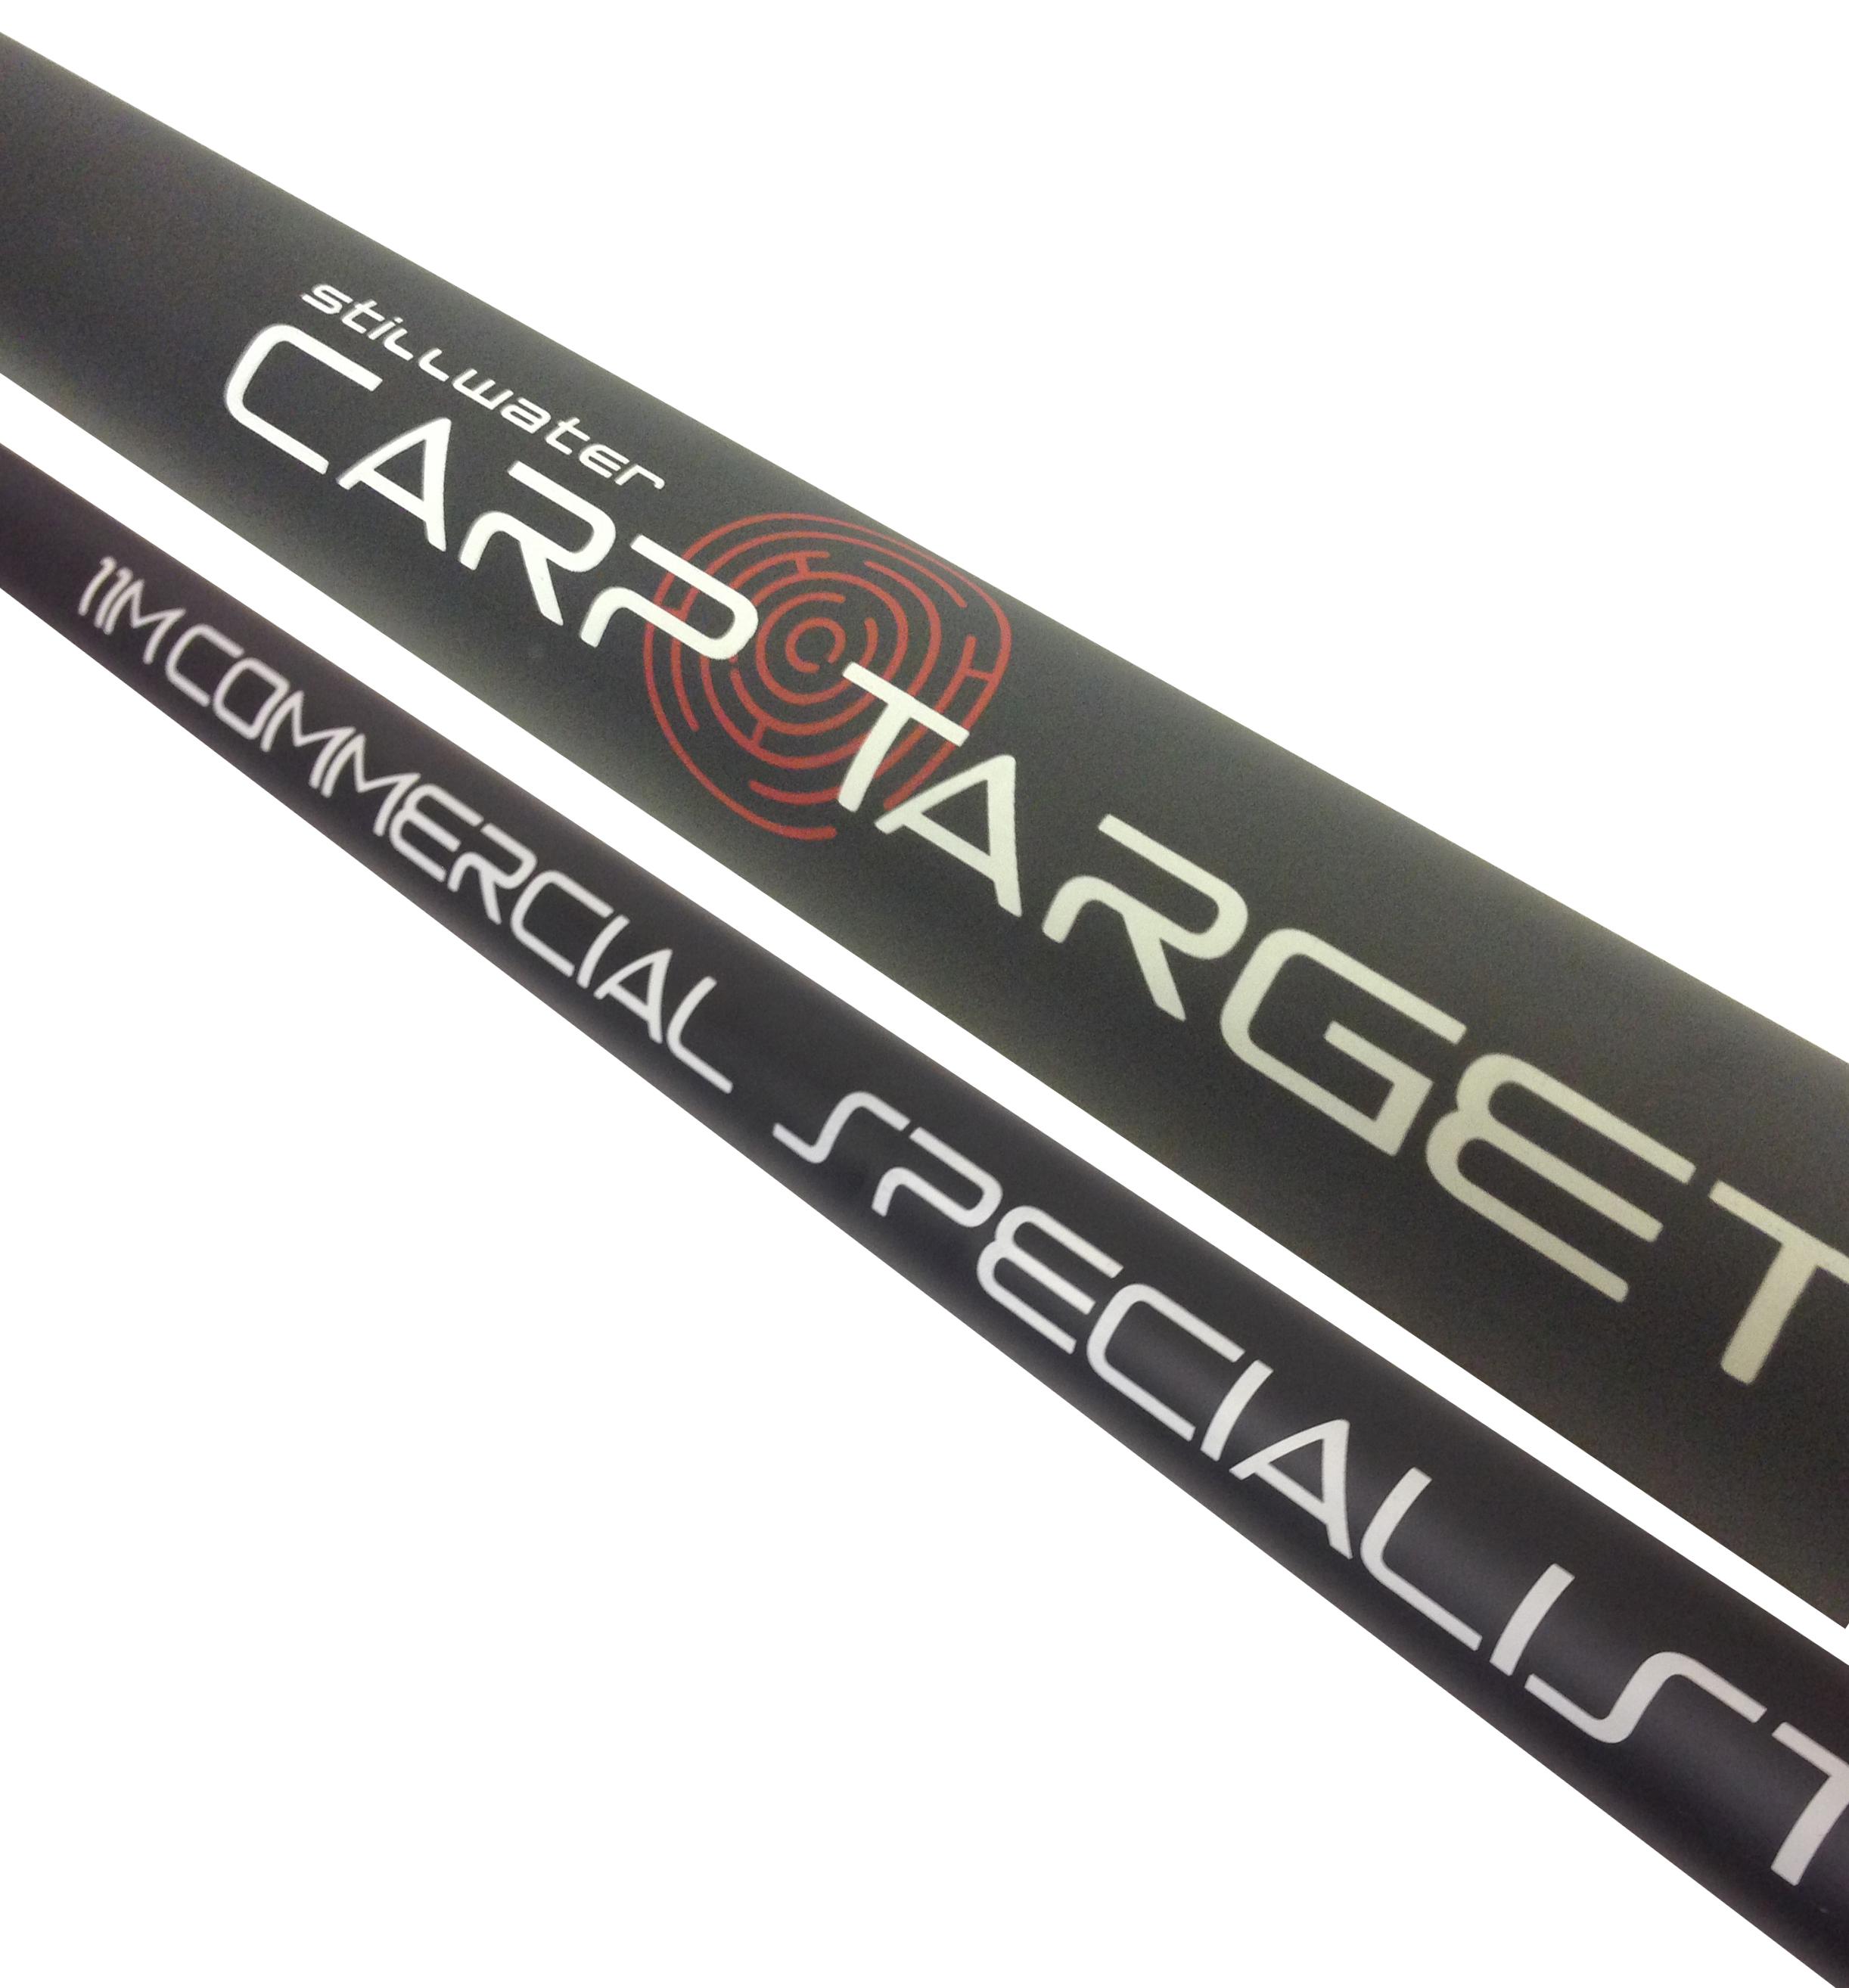 Stillwater carp target promo pole top 3 kit glasgow for Target fishing pole